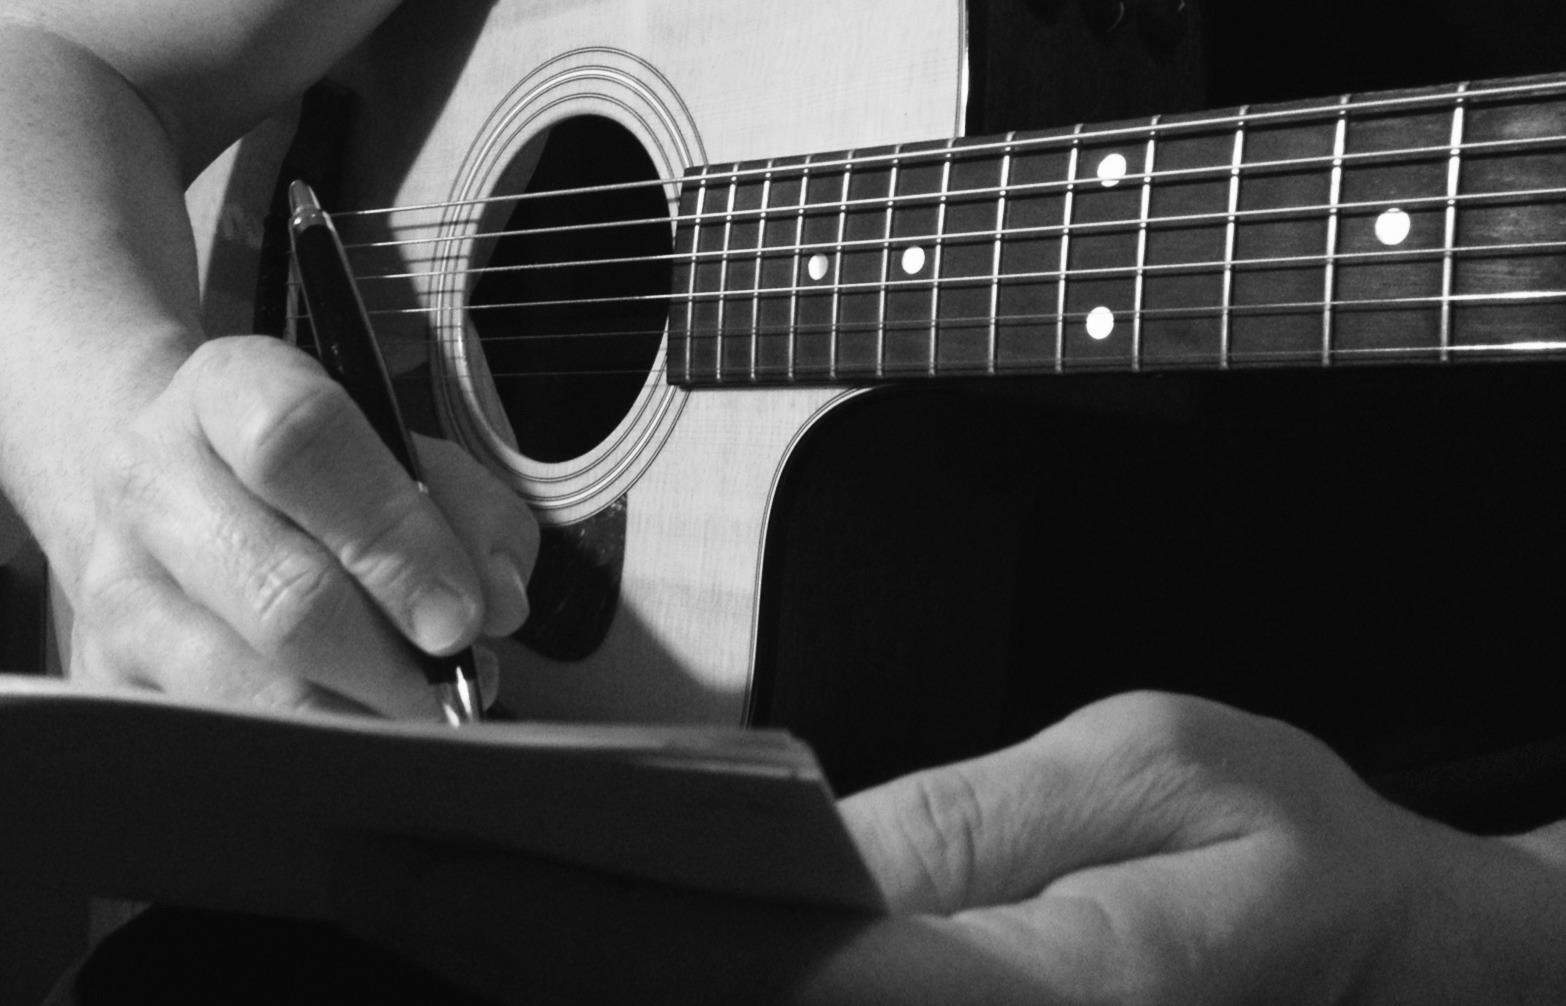 pietro-cirillo-officine-popolari-lucane-chitarra